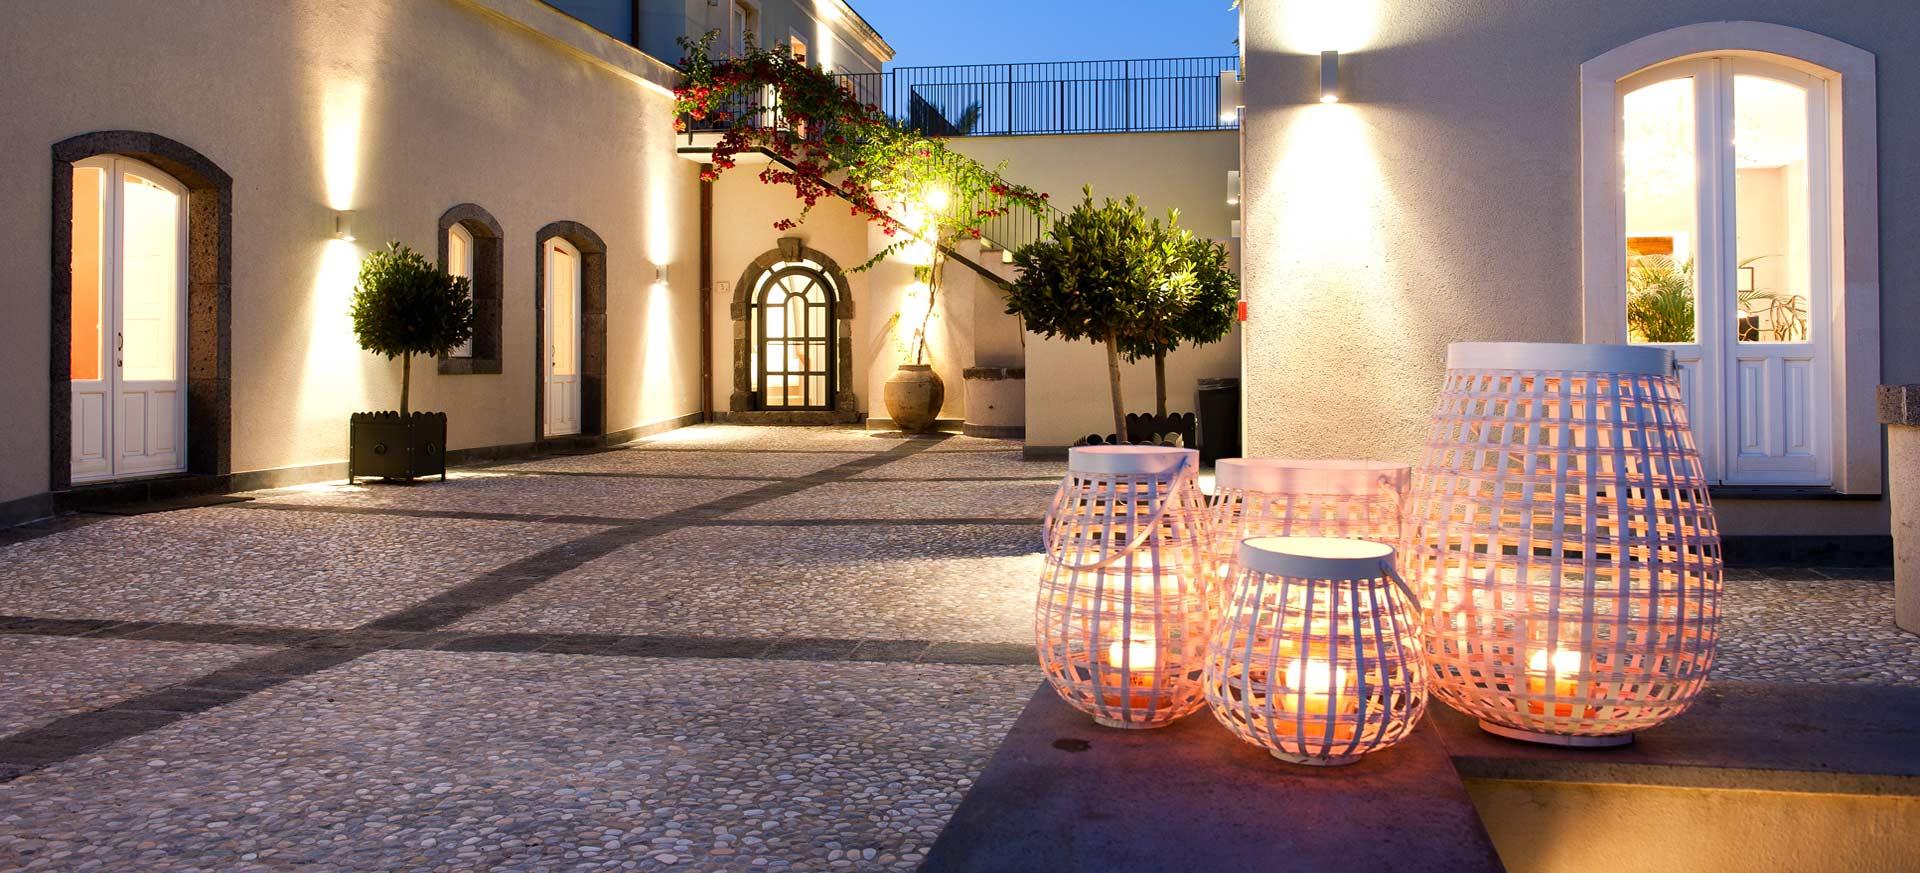 Luxury Hotel Etna Acireale